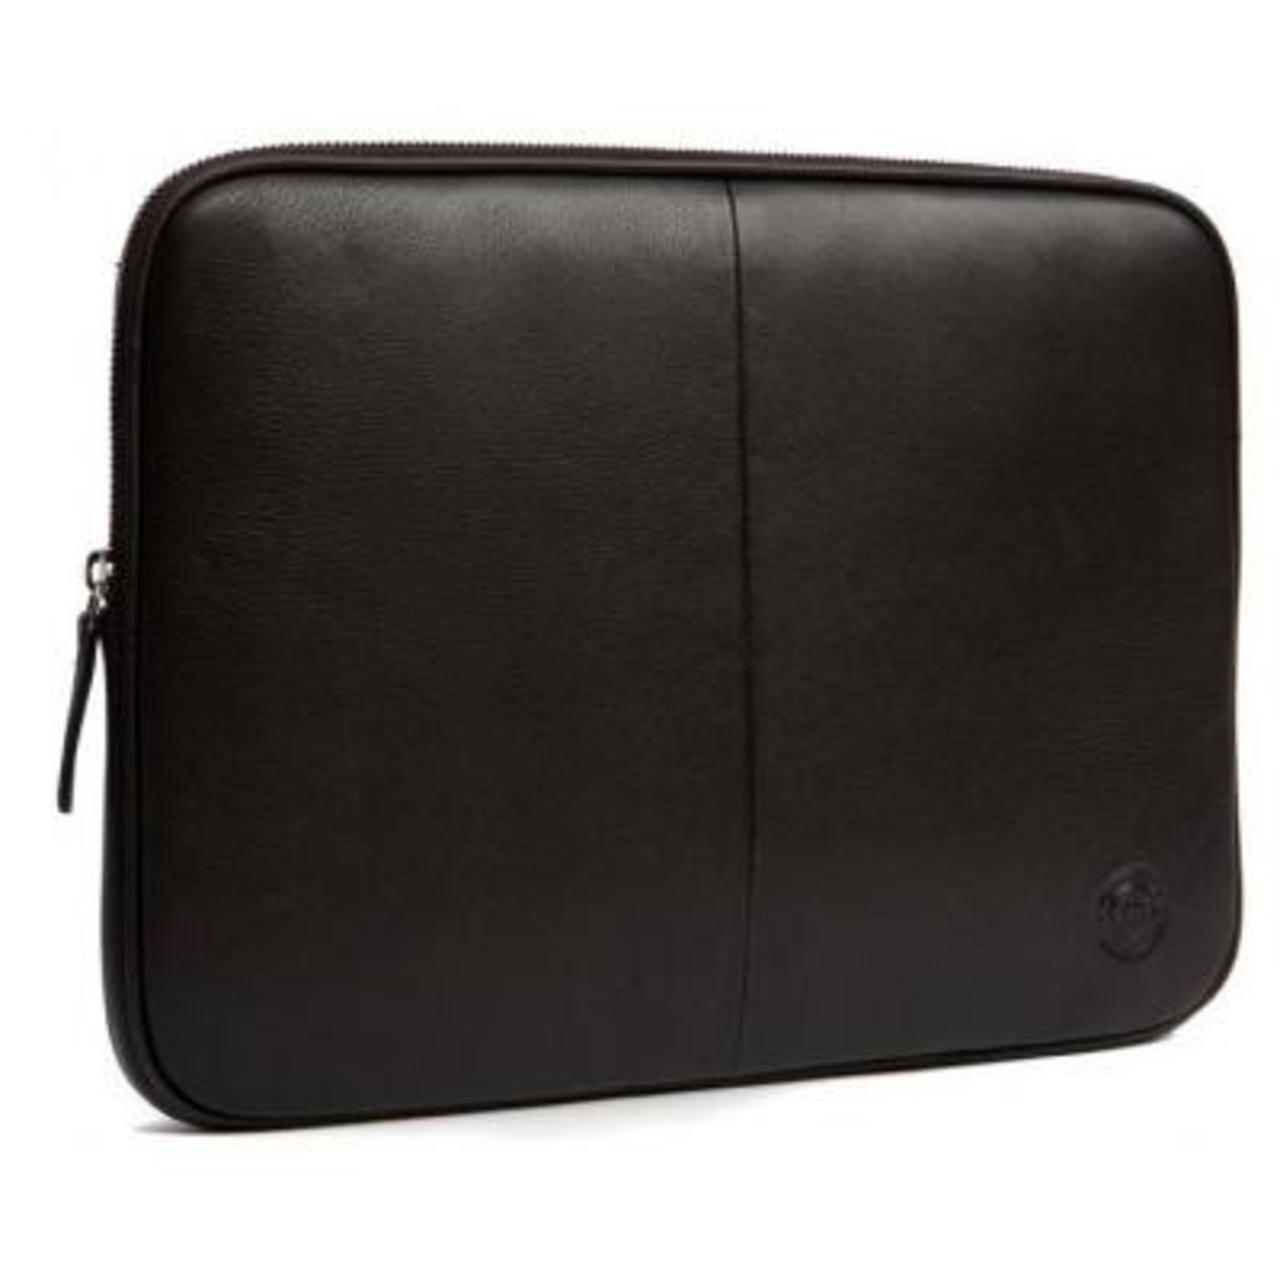 D. Bramante Leather Sleeve Case for MacBook Pro 13, Premium Brown (CA13PRBR0237)